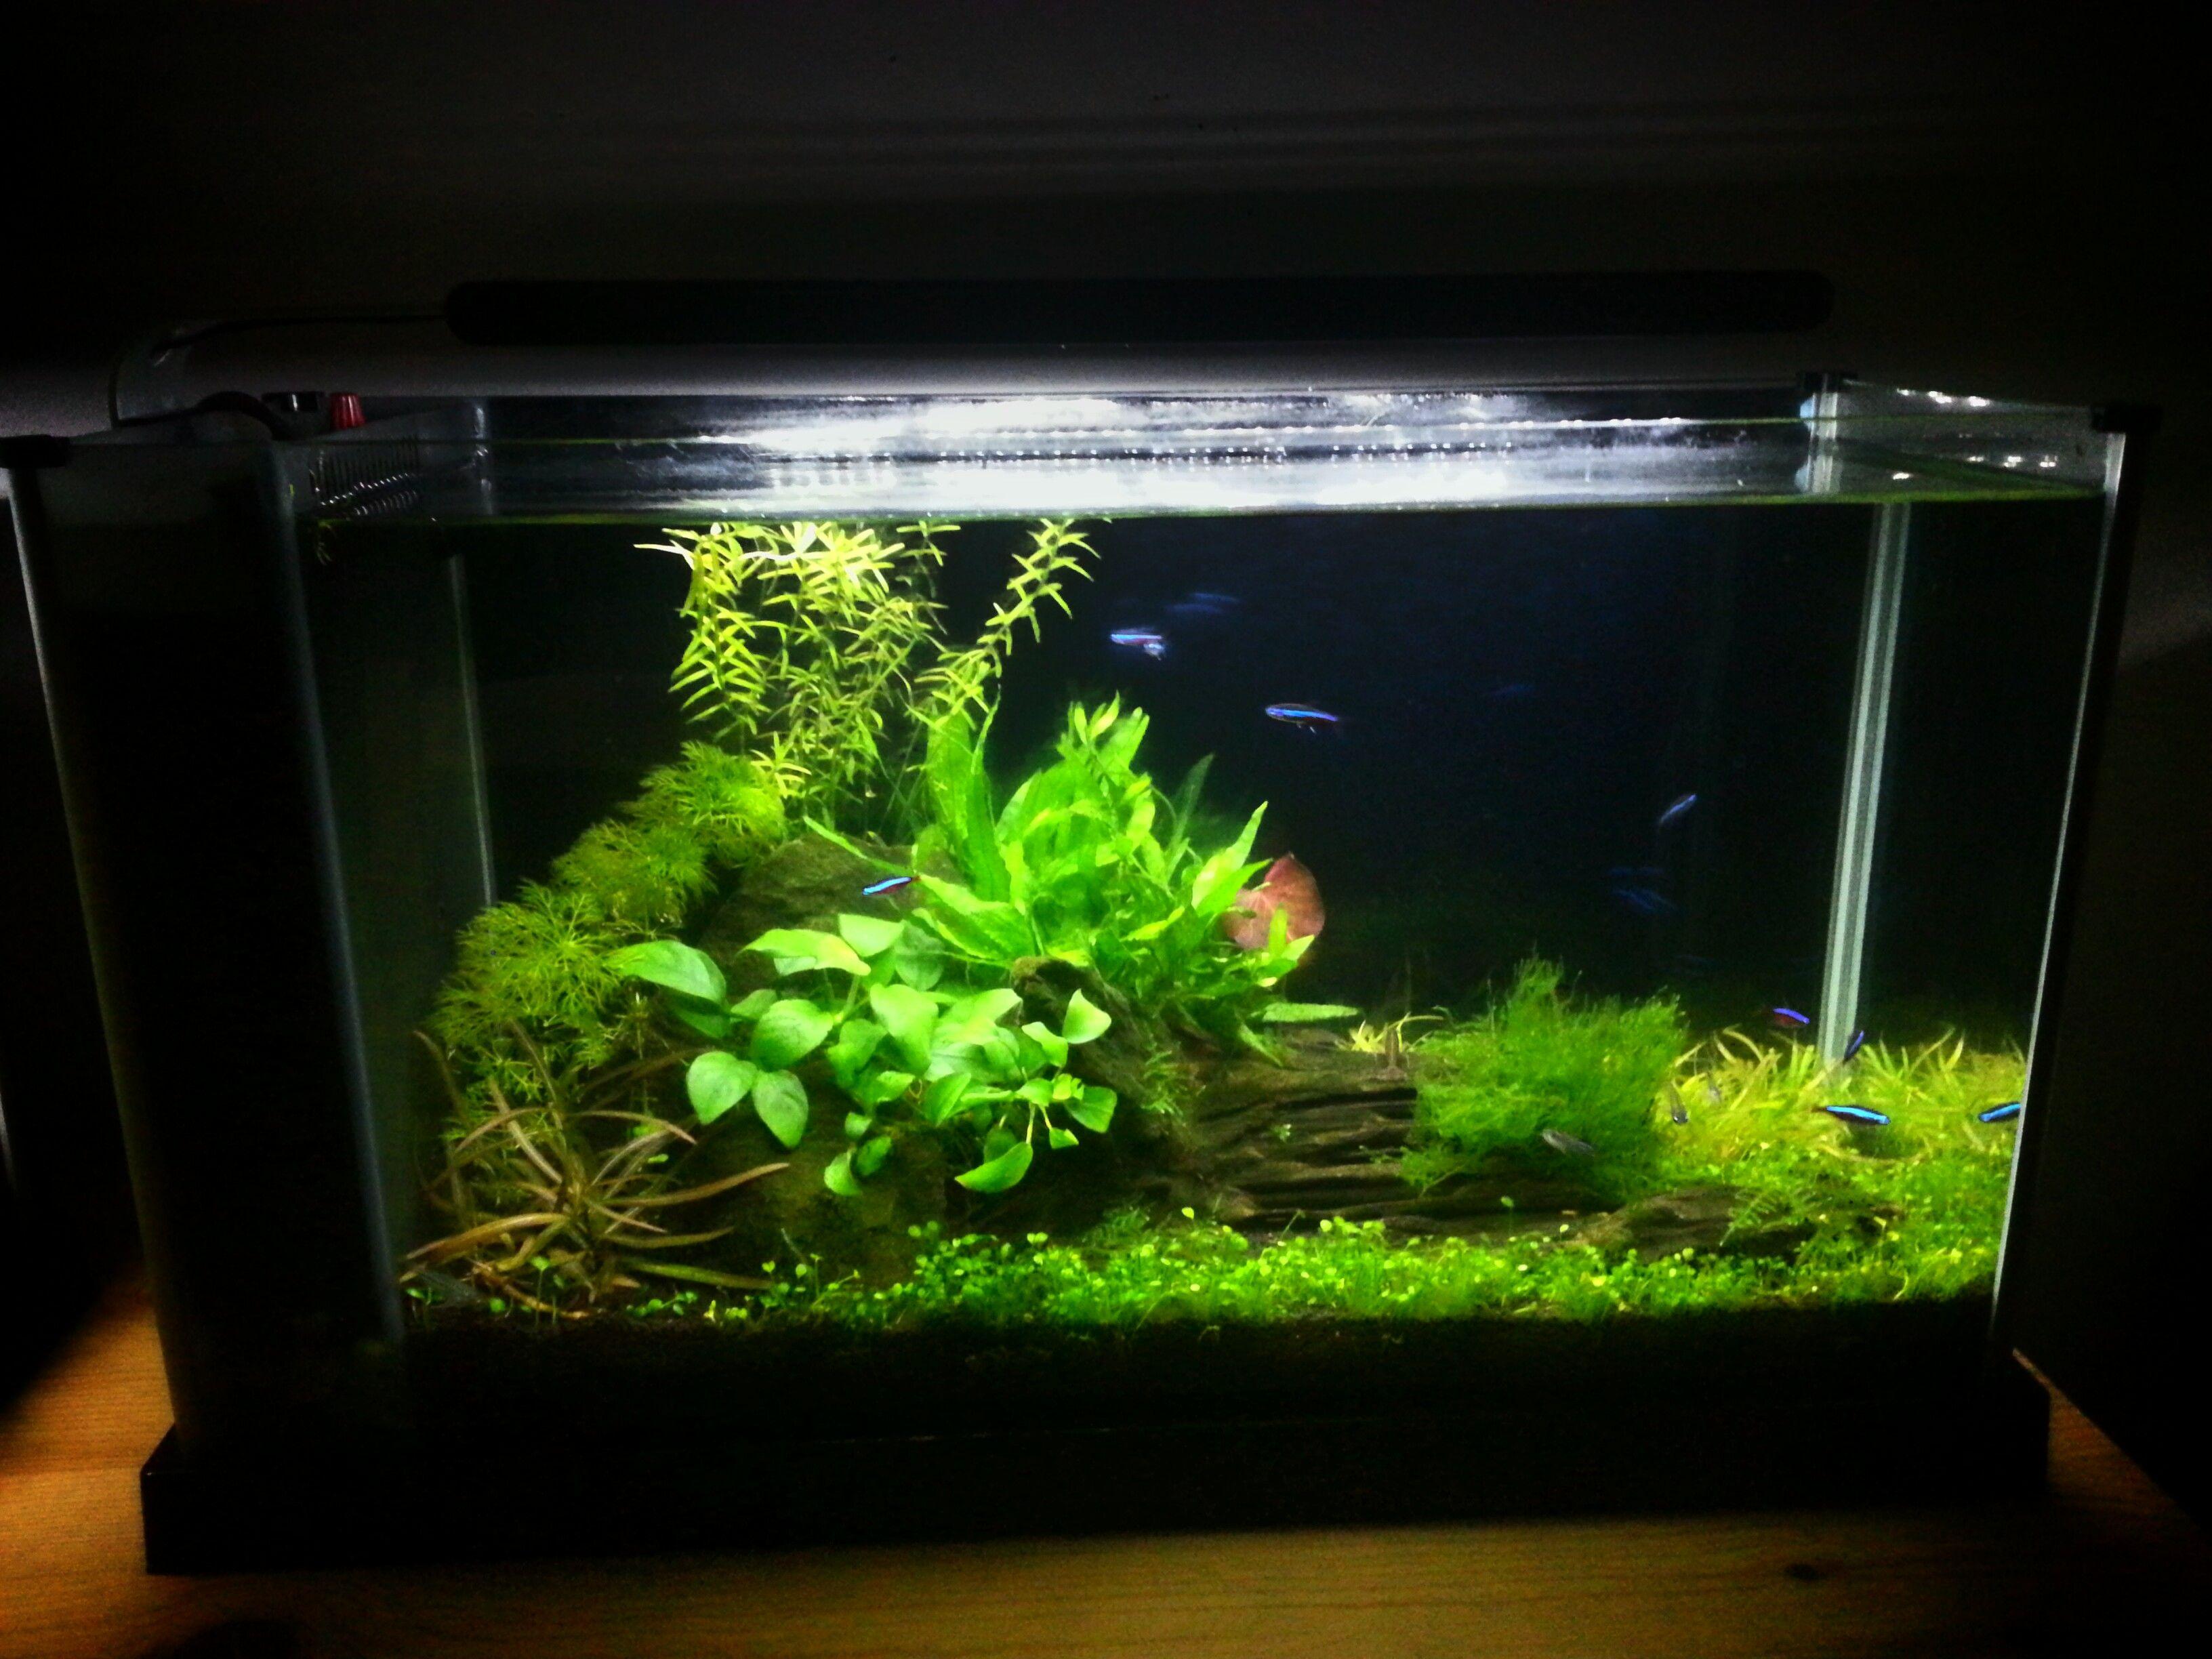 My planted nano tanks and 15 000 gallon koi pond i 39 m open for Plante nano aquarium